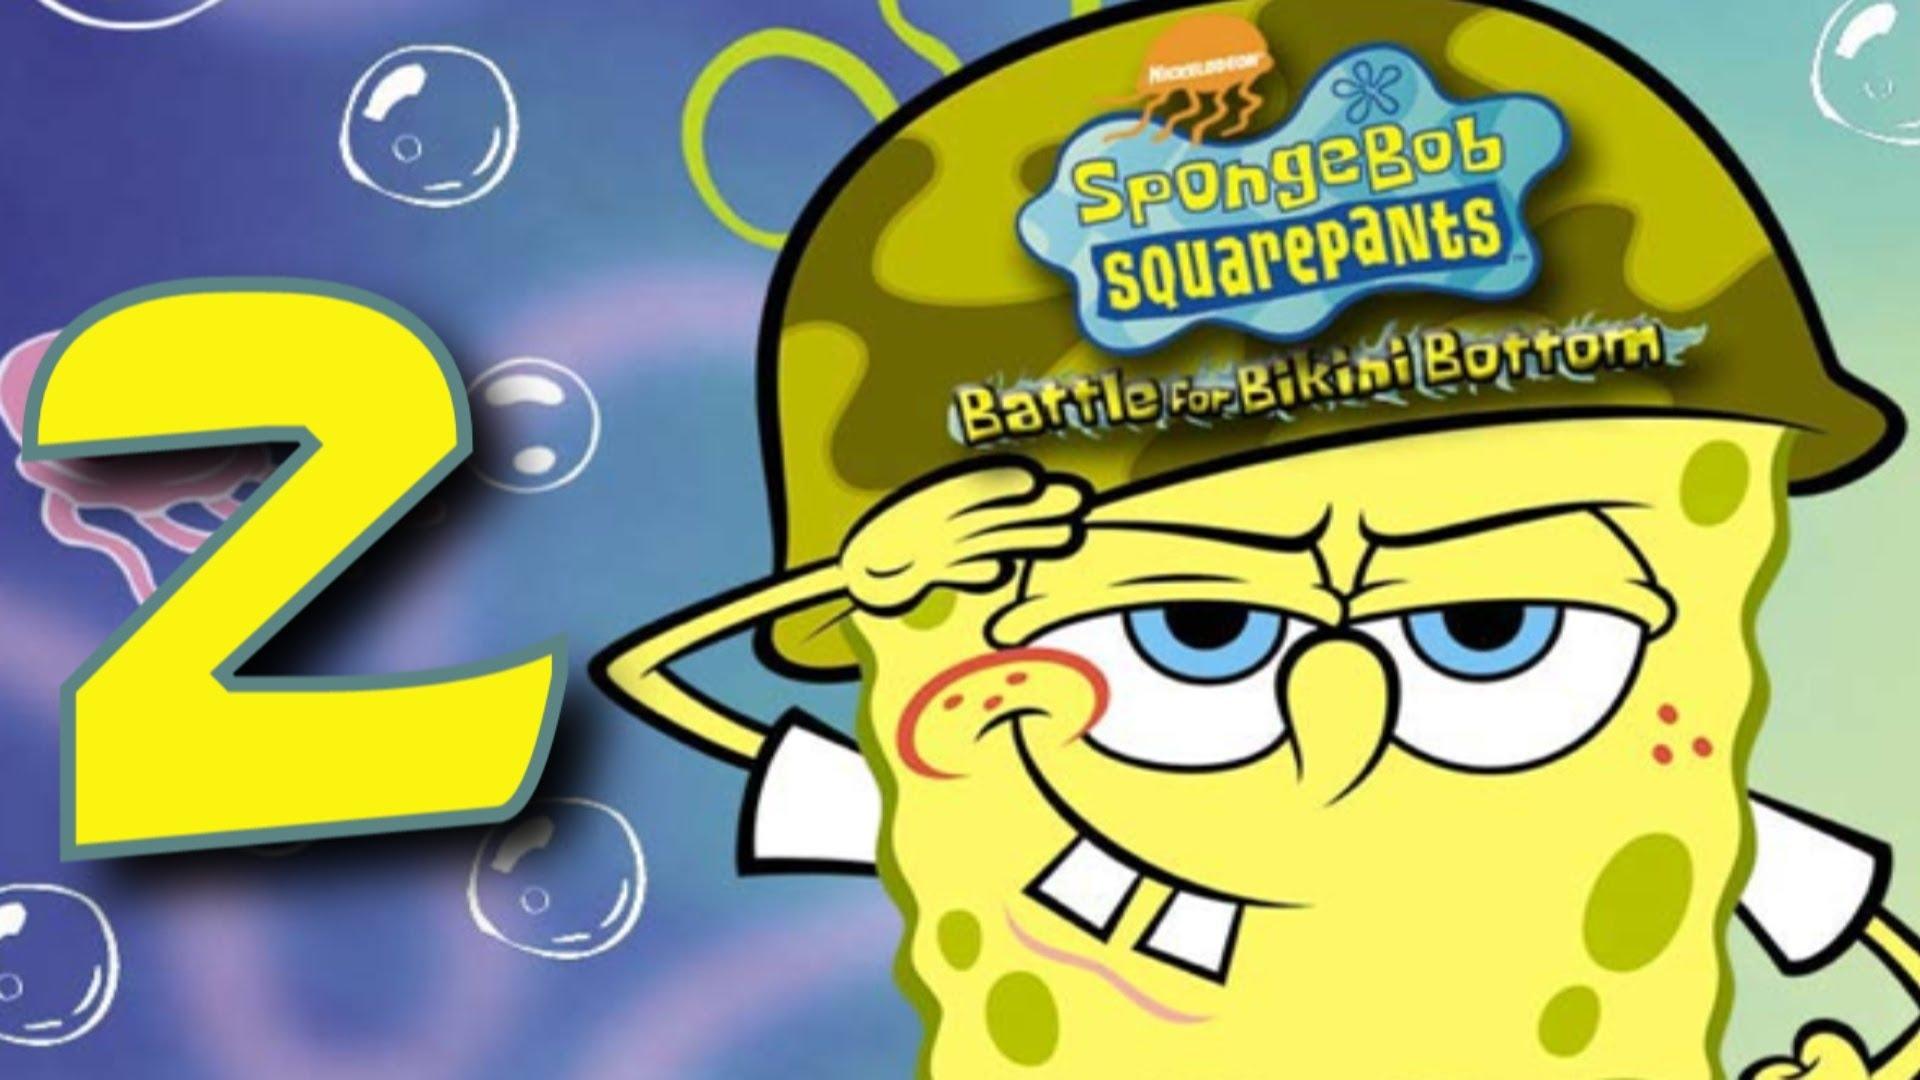 Spongebob Squarepants Movie Wallpaper HD Desktop Wallpaper 1920x1080